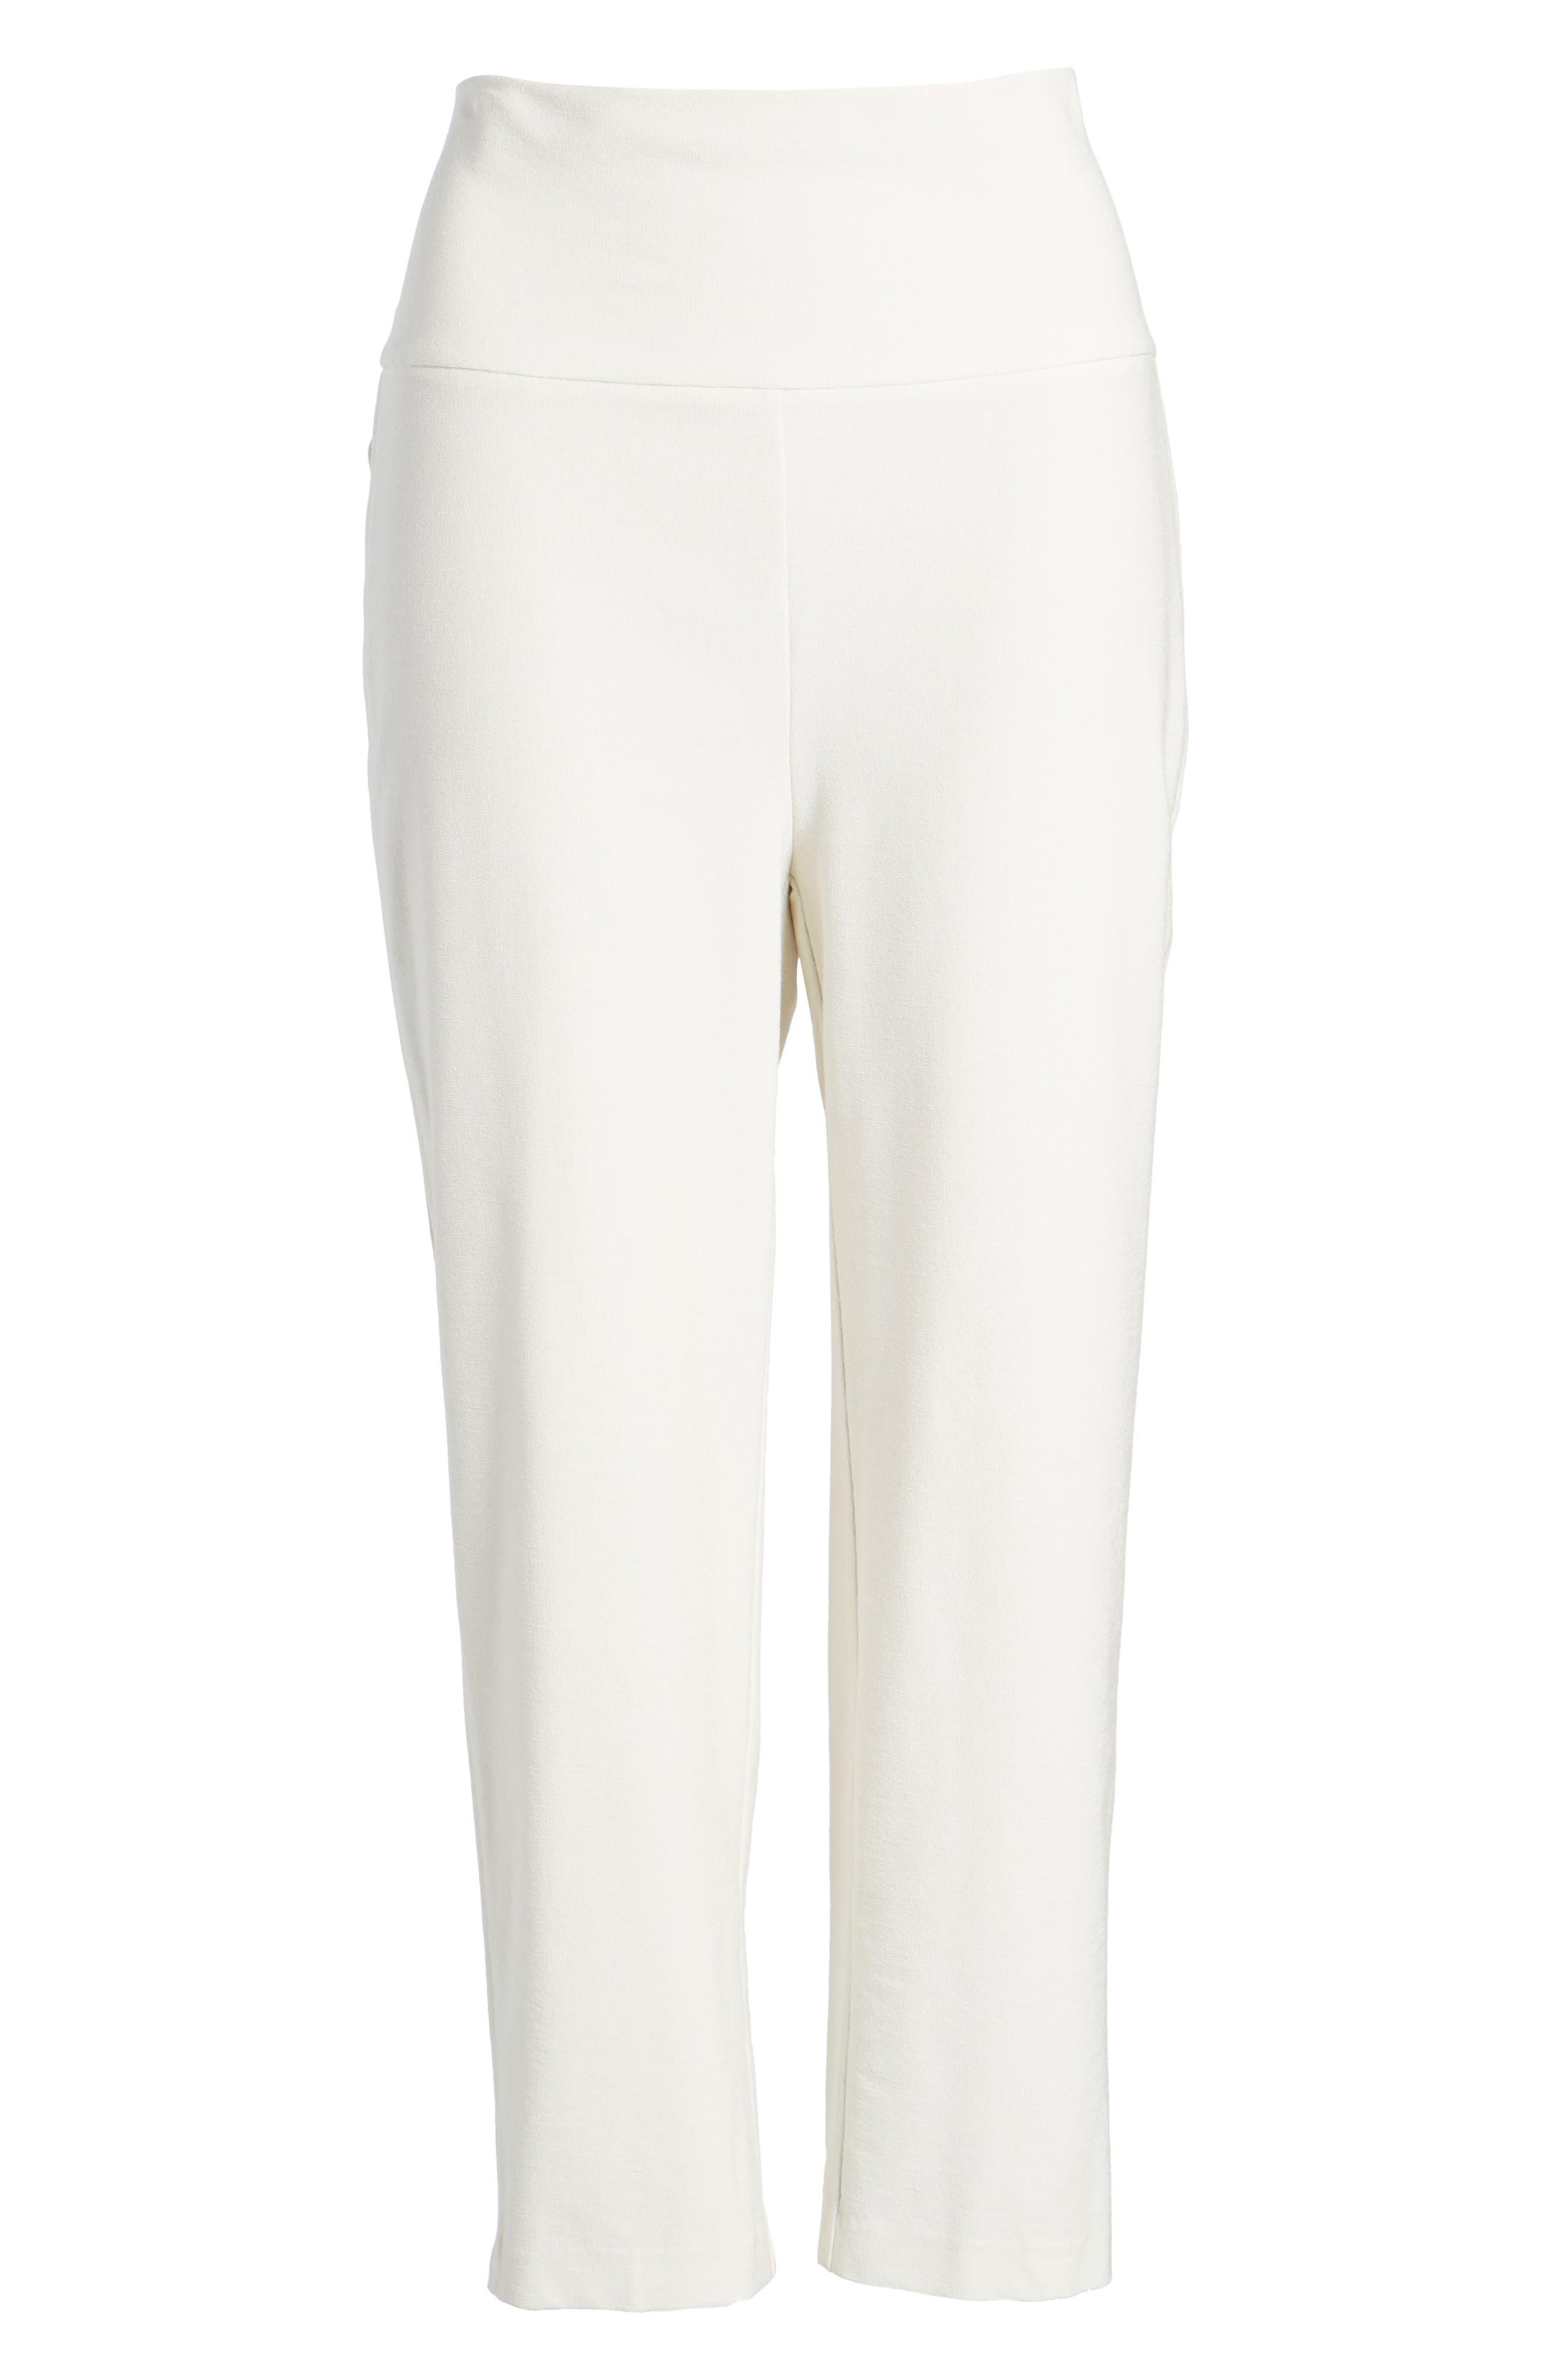 Foldover Waist Stretch Crepe Capri Pants,                             Alternate thumbnail 7, color,                             907